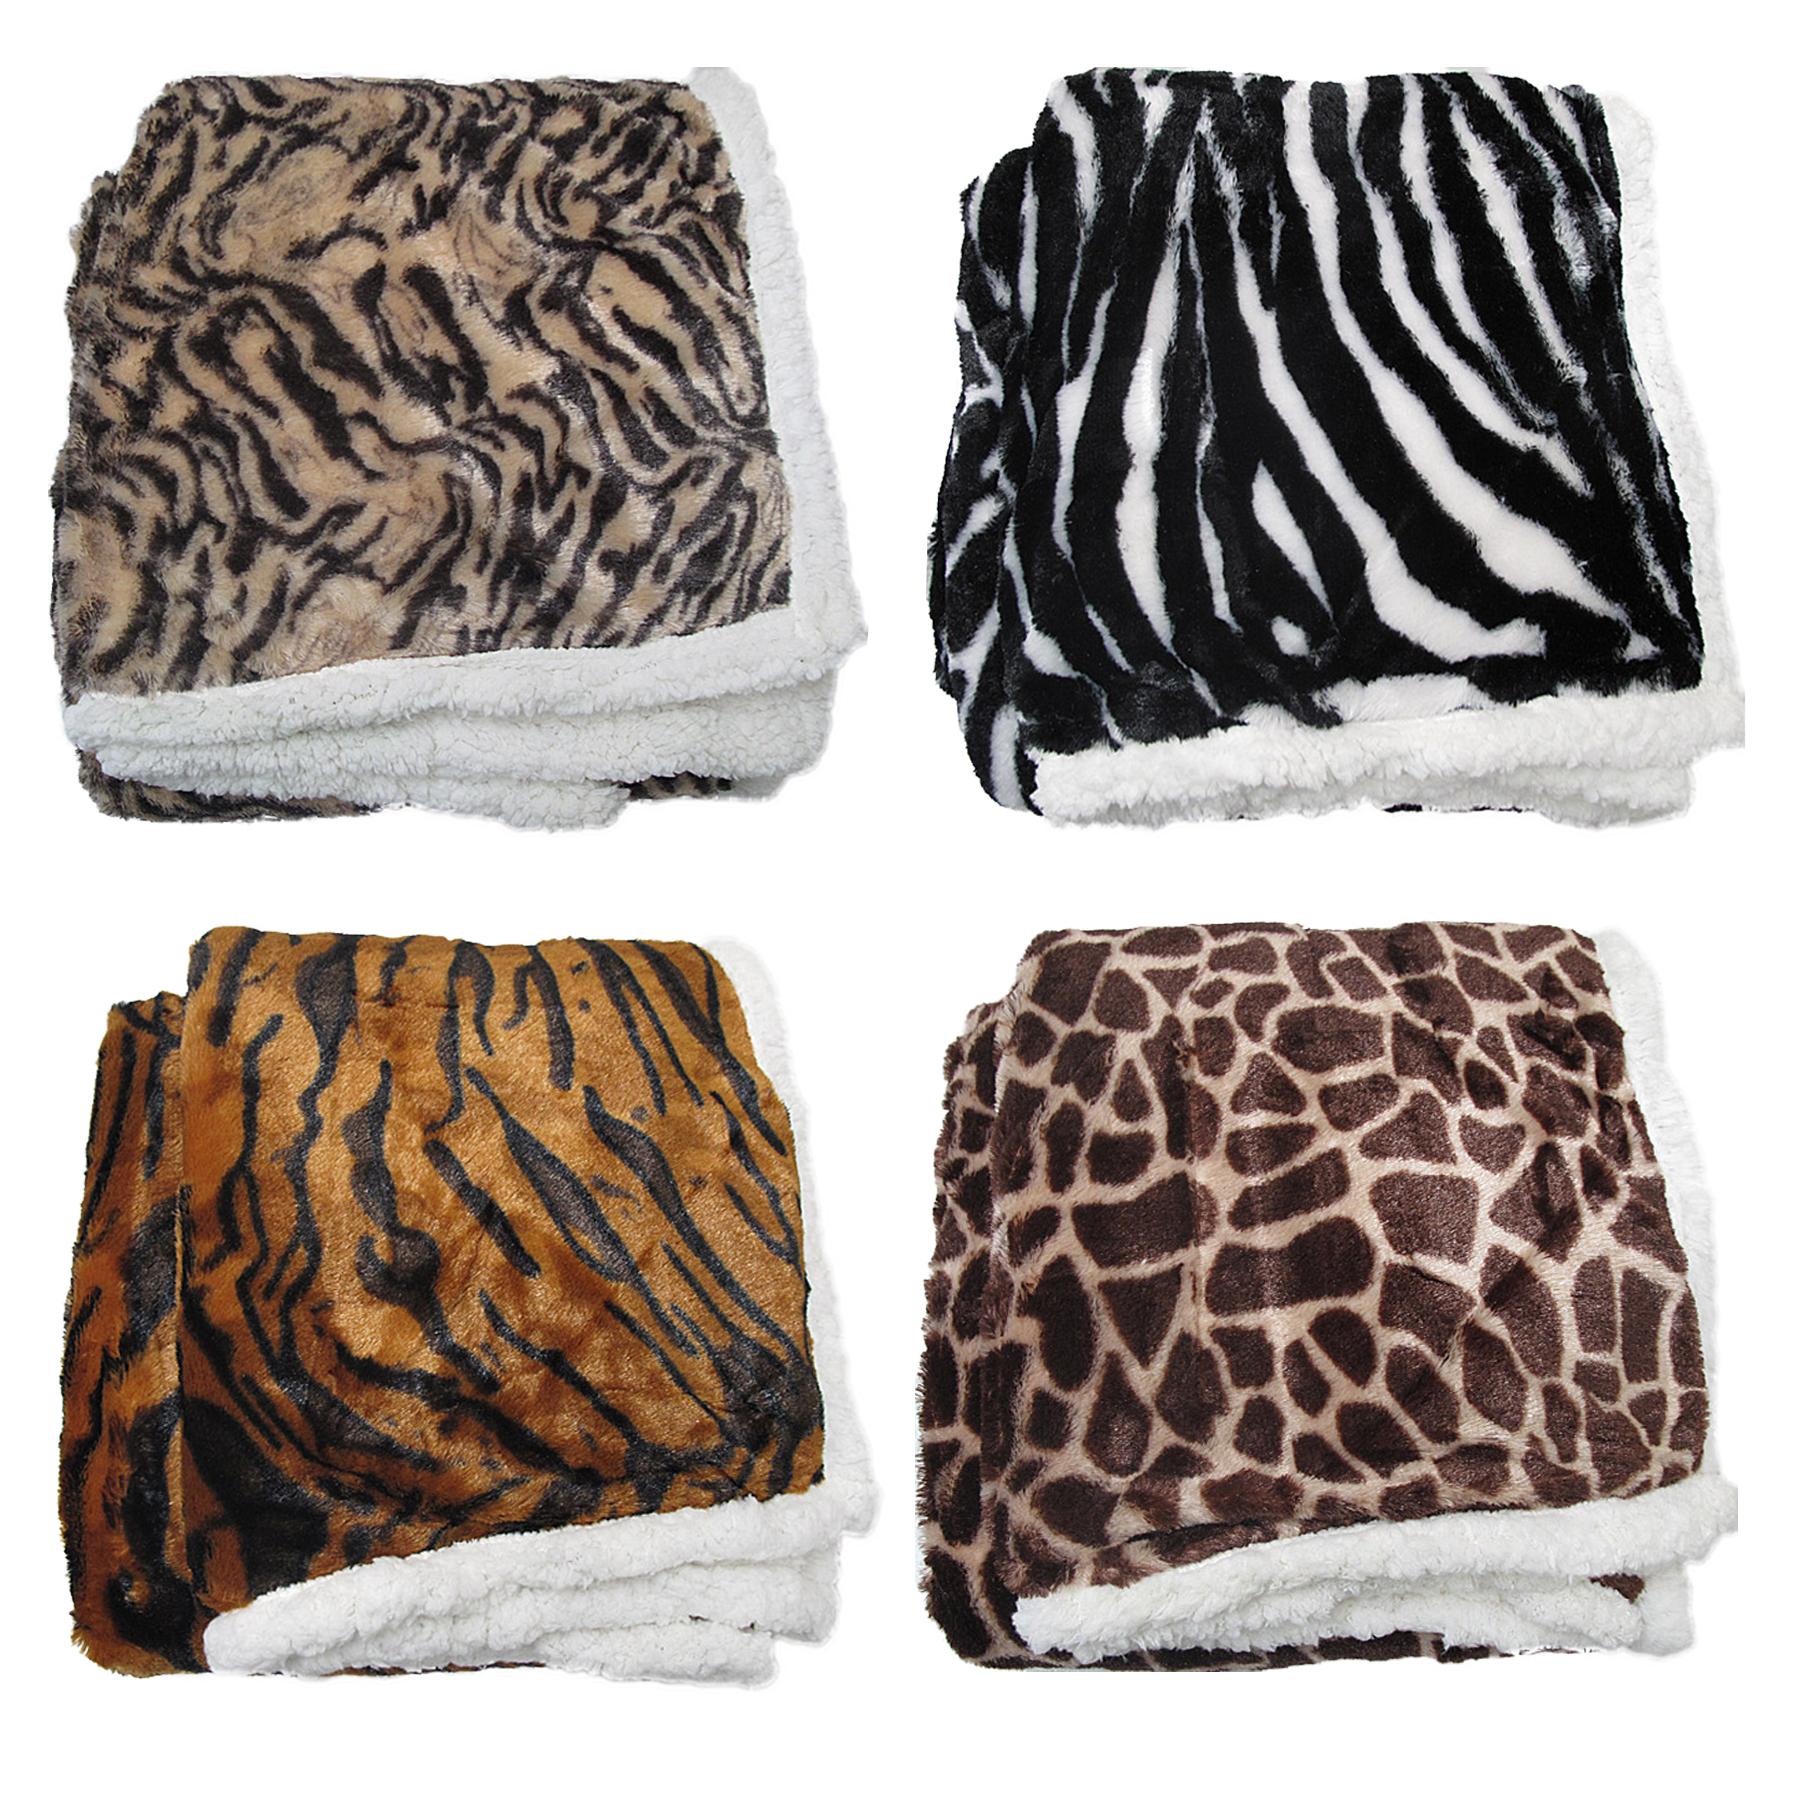 Leopard Zebra Tiger Giraffe Luxurious Faux Fur